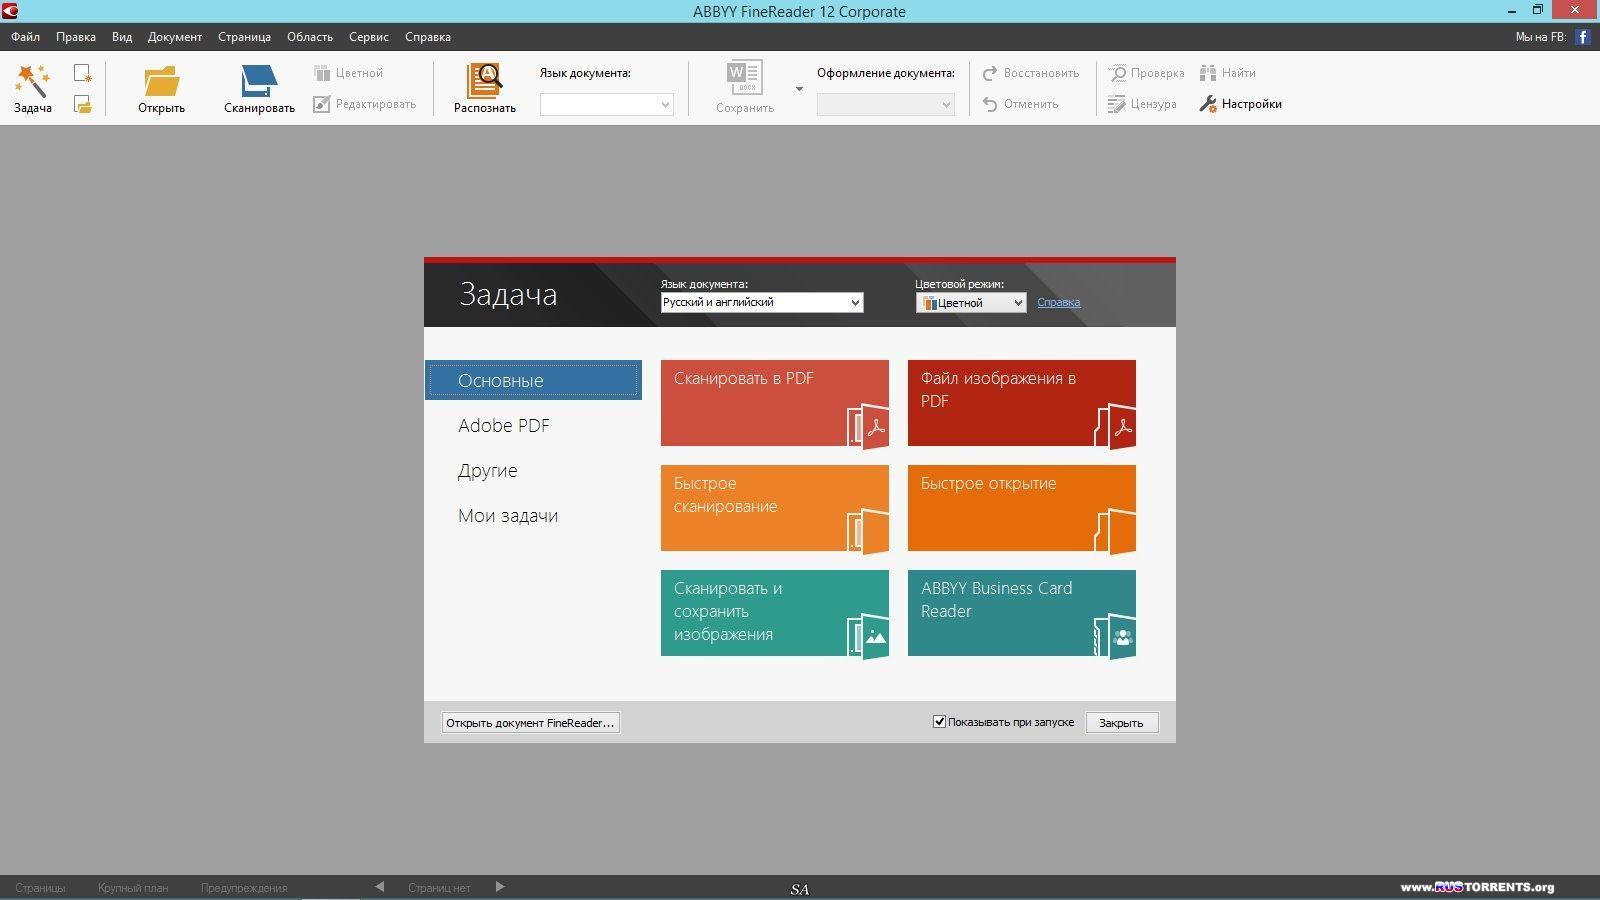 ABBYY FineReader 12.0.101.388 Corporate